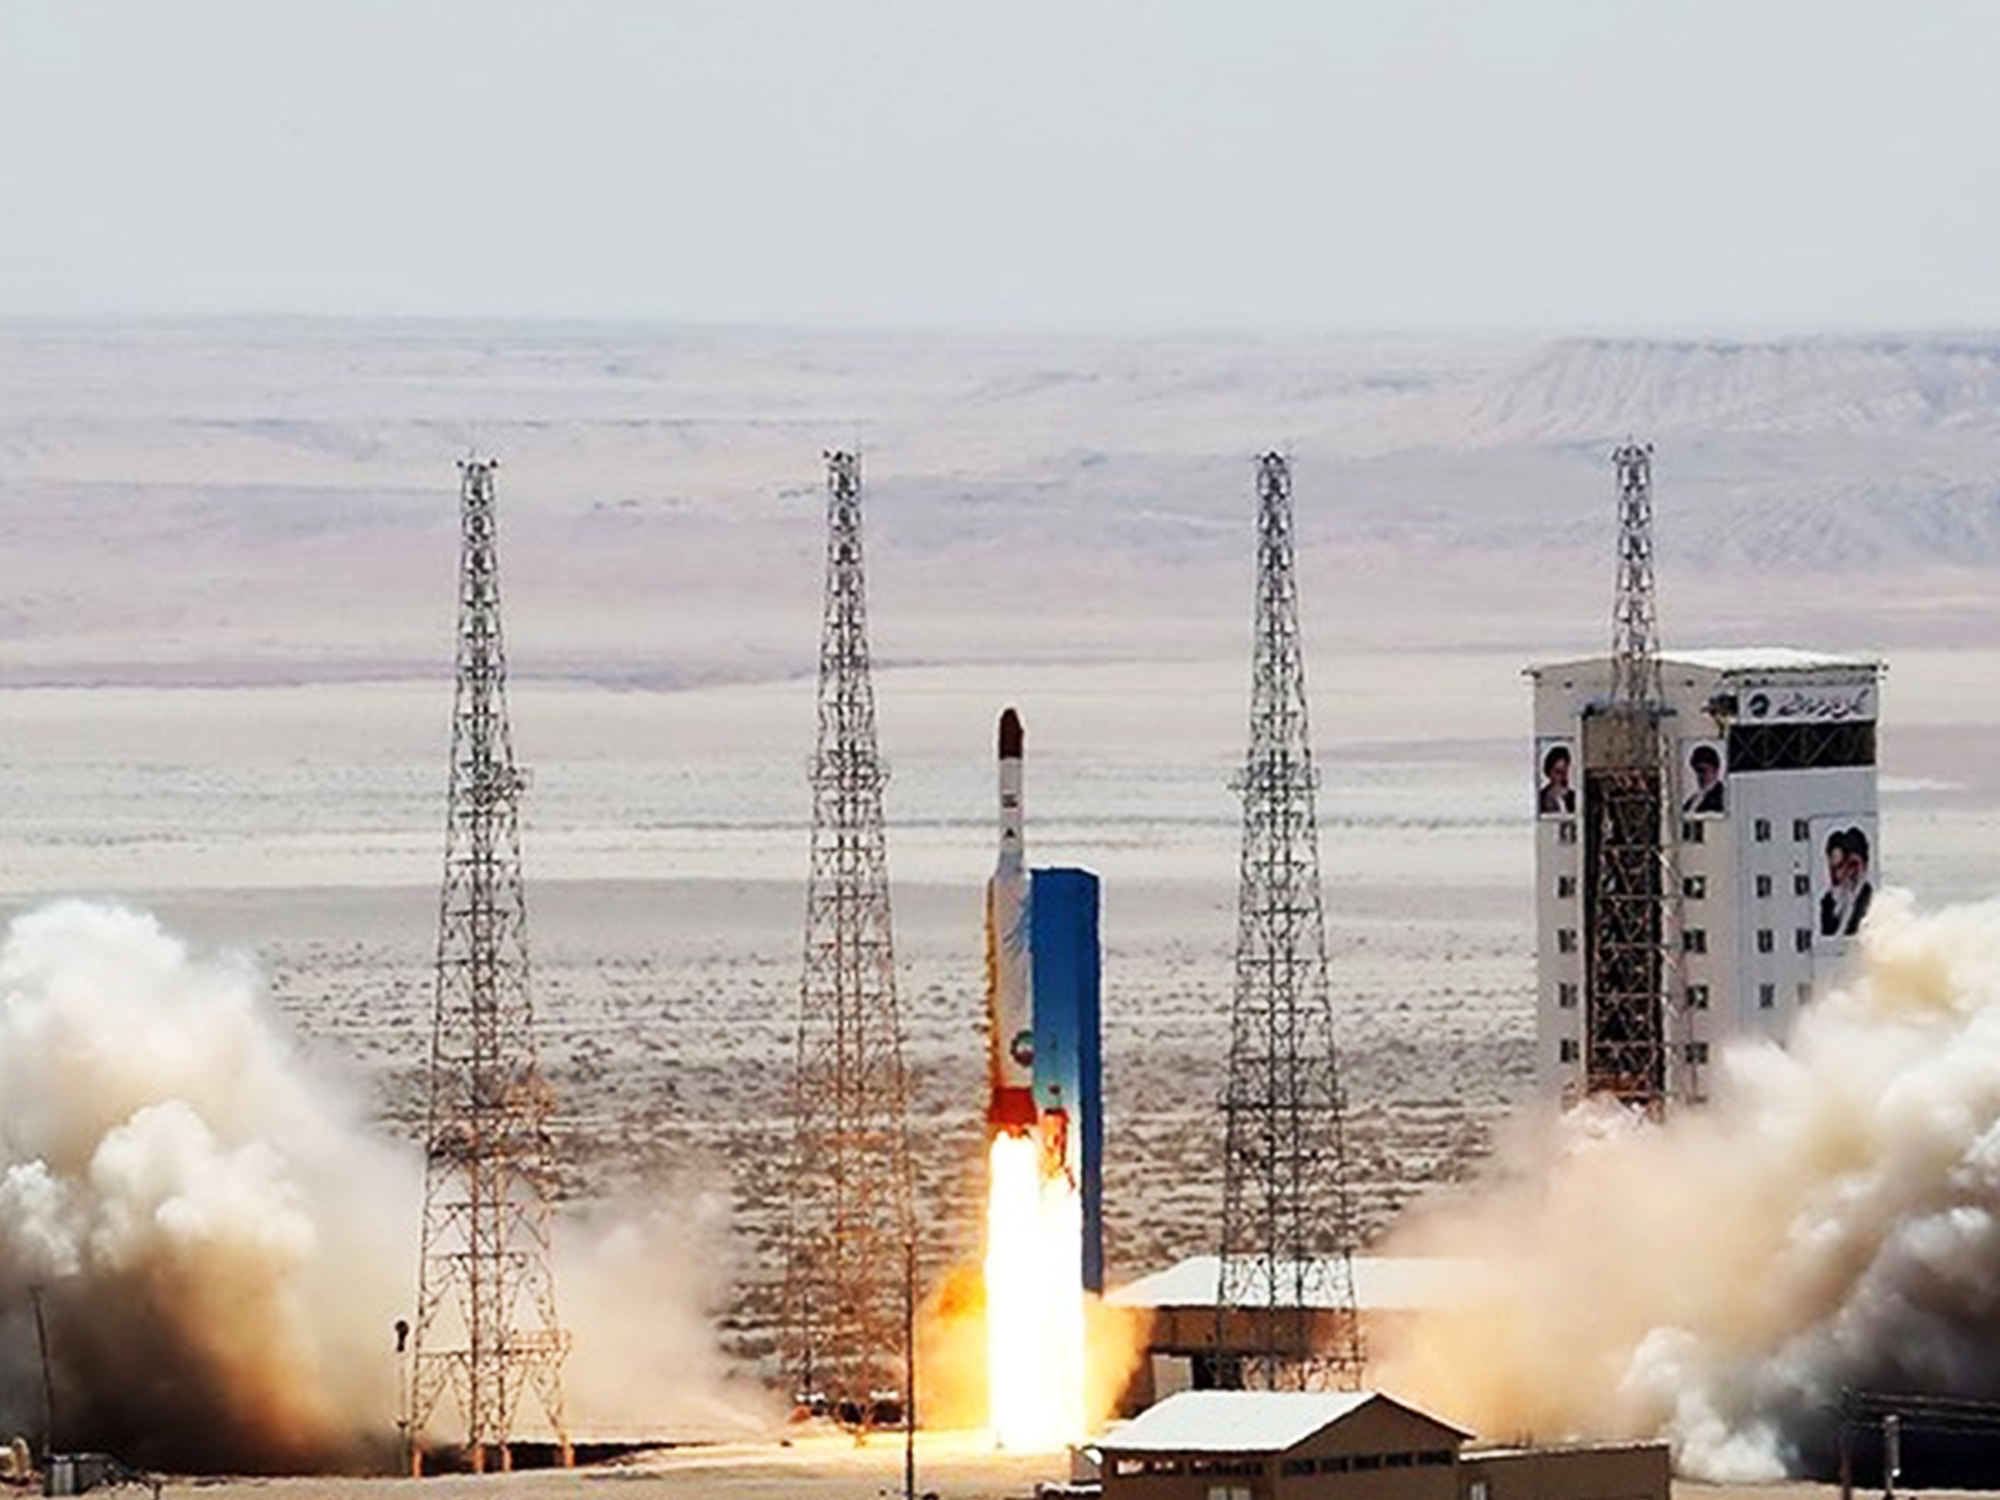 لحظه ی پرتاب ماهواره بر سفیر سیمرغ A-1